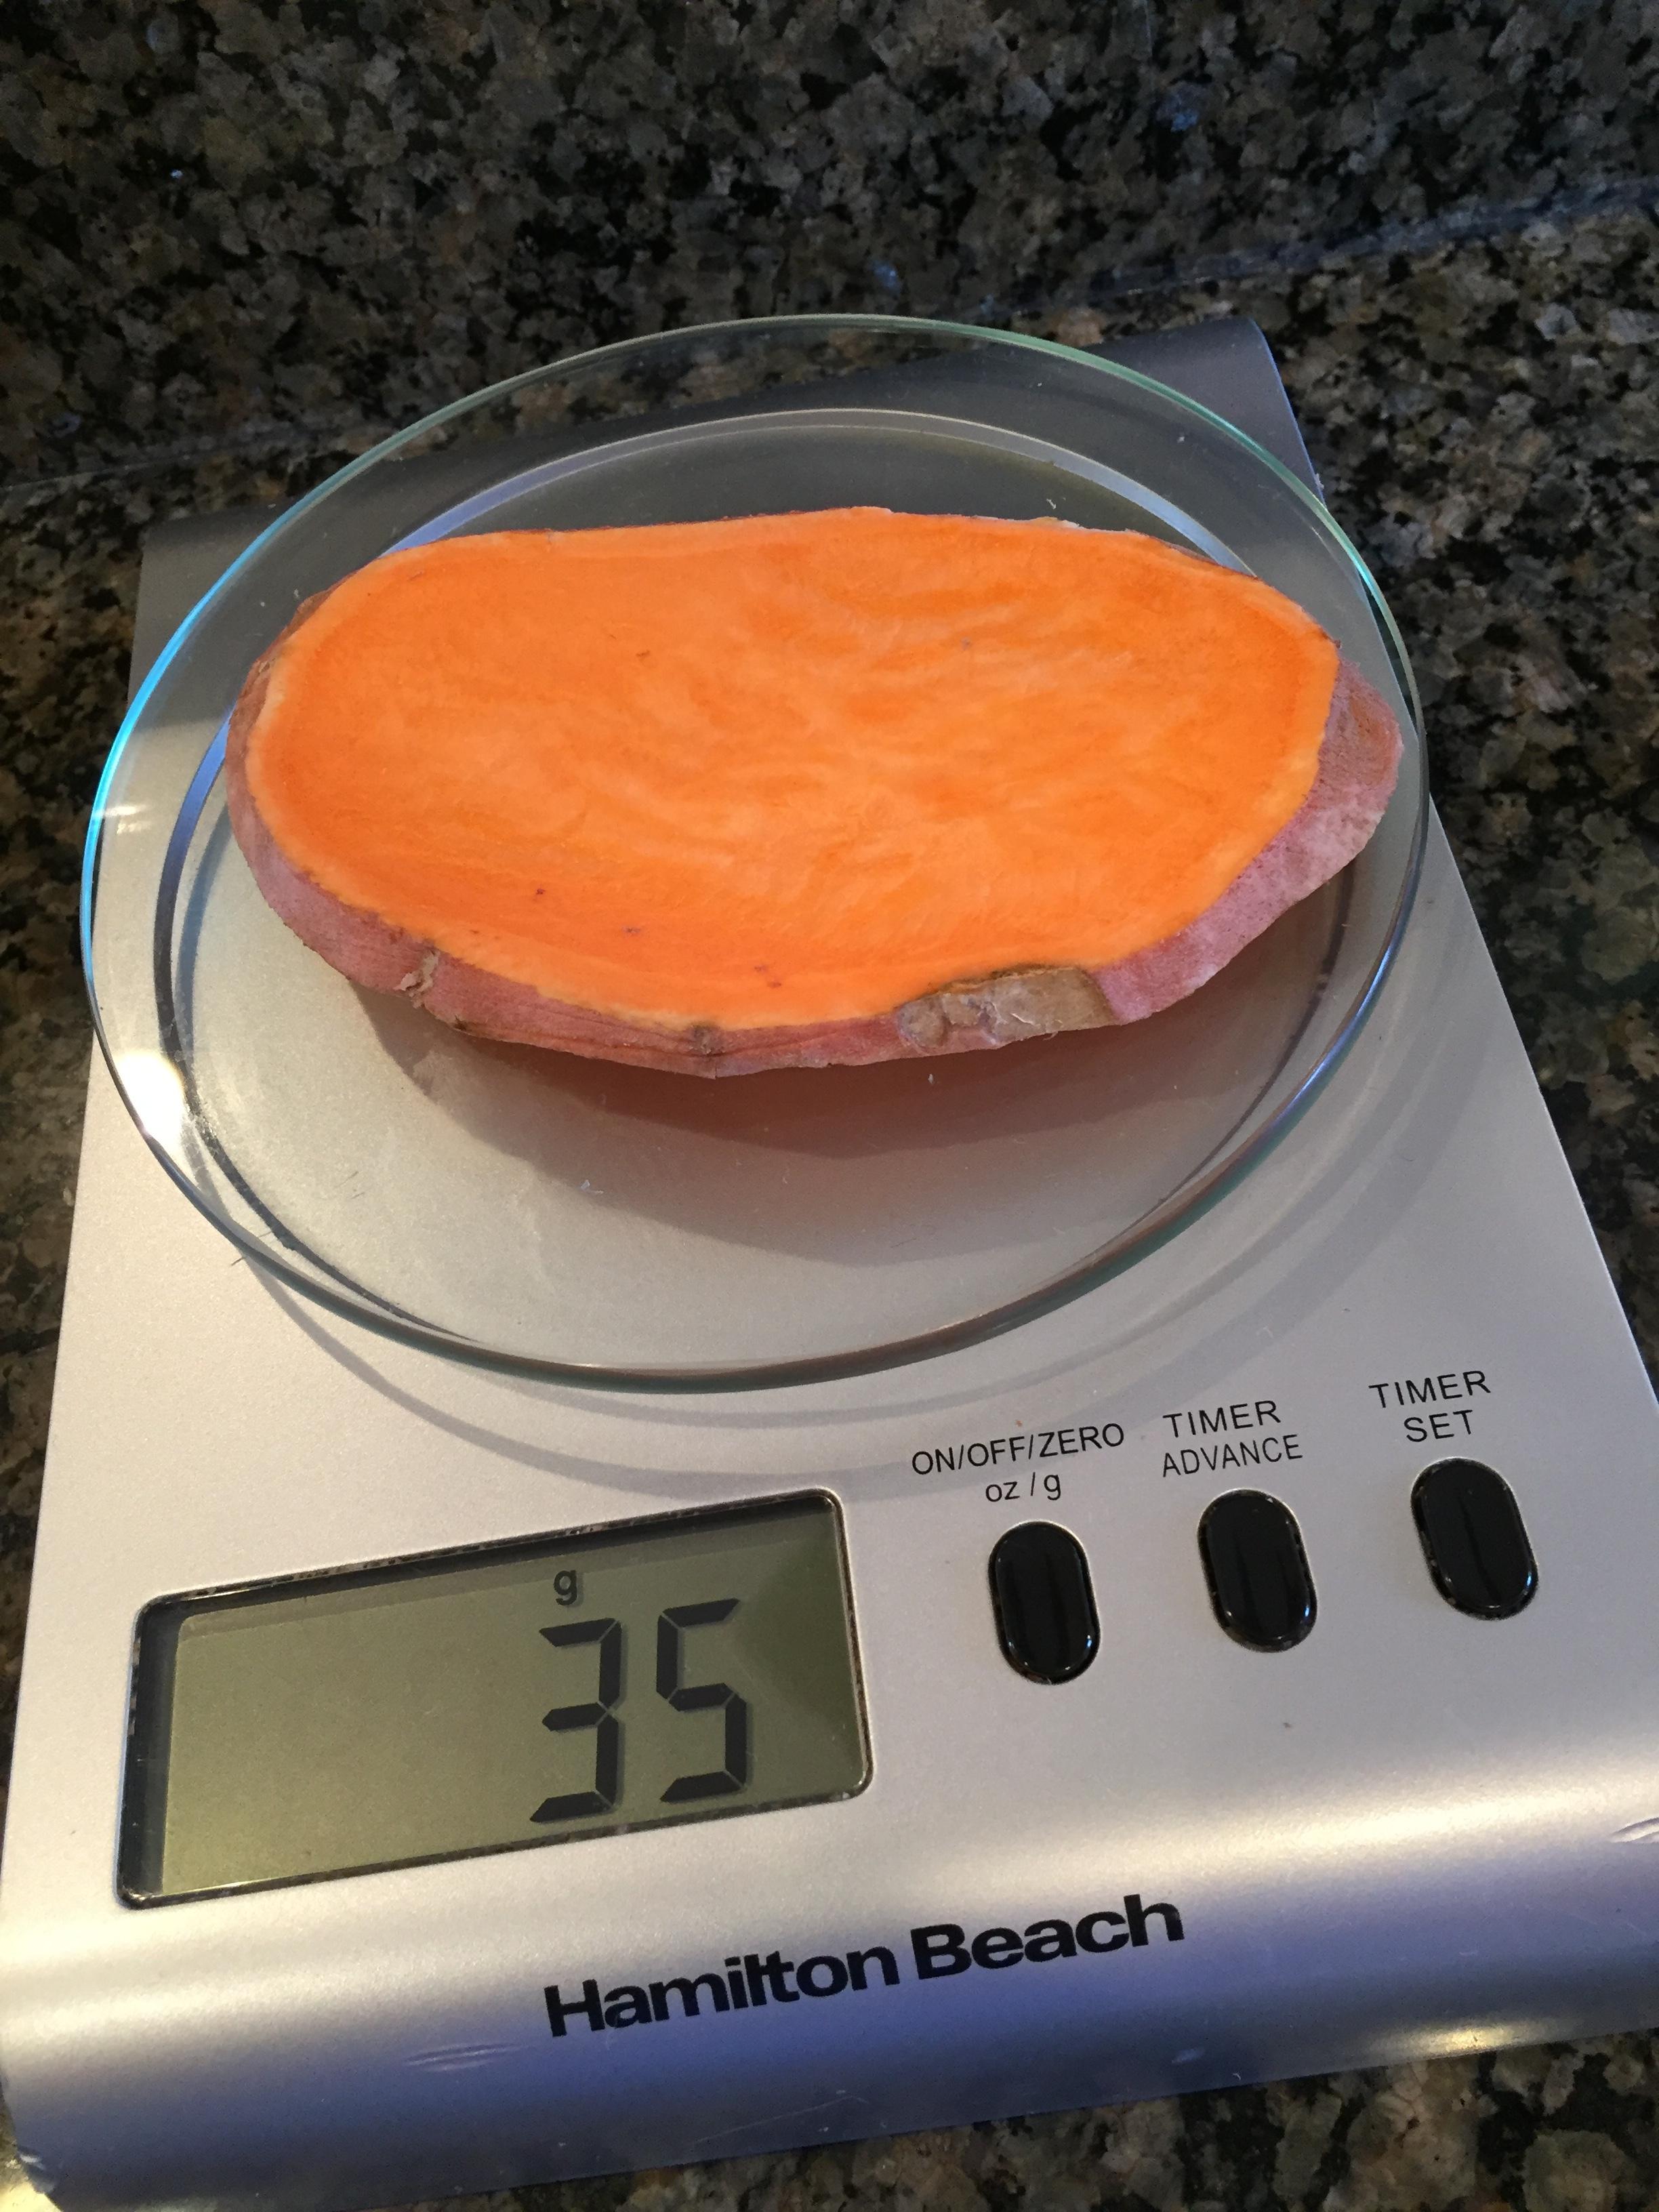 1/4 inch slice - 1.2 ounces or 35 grams